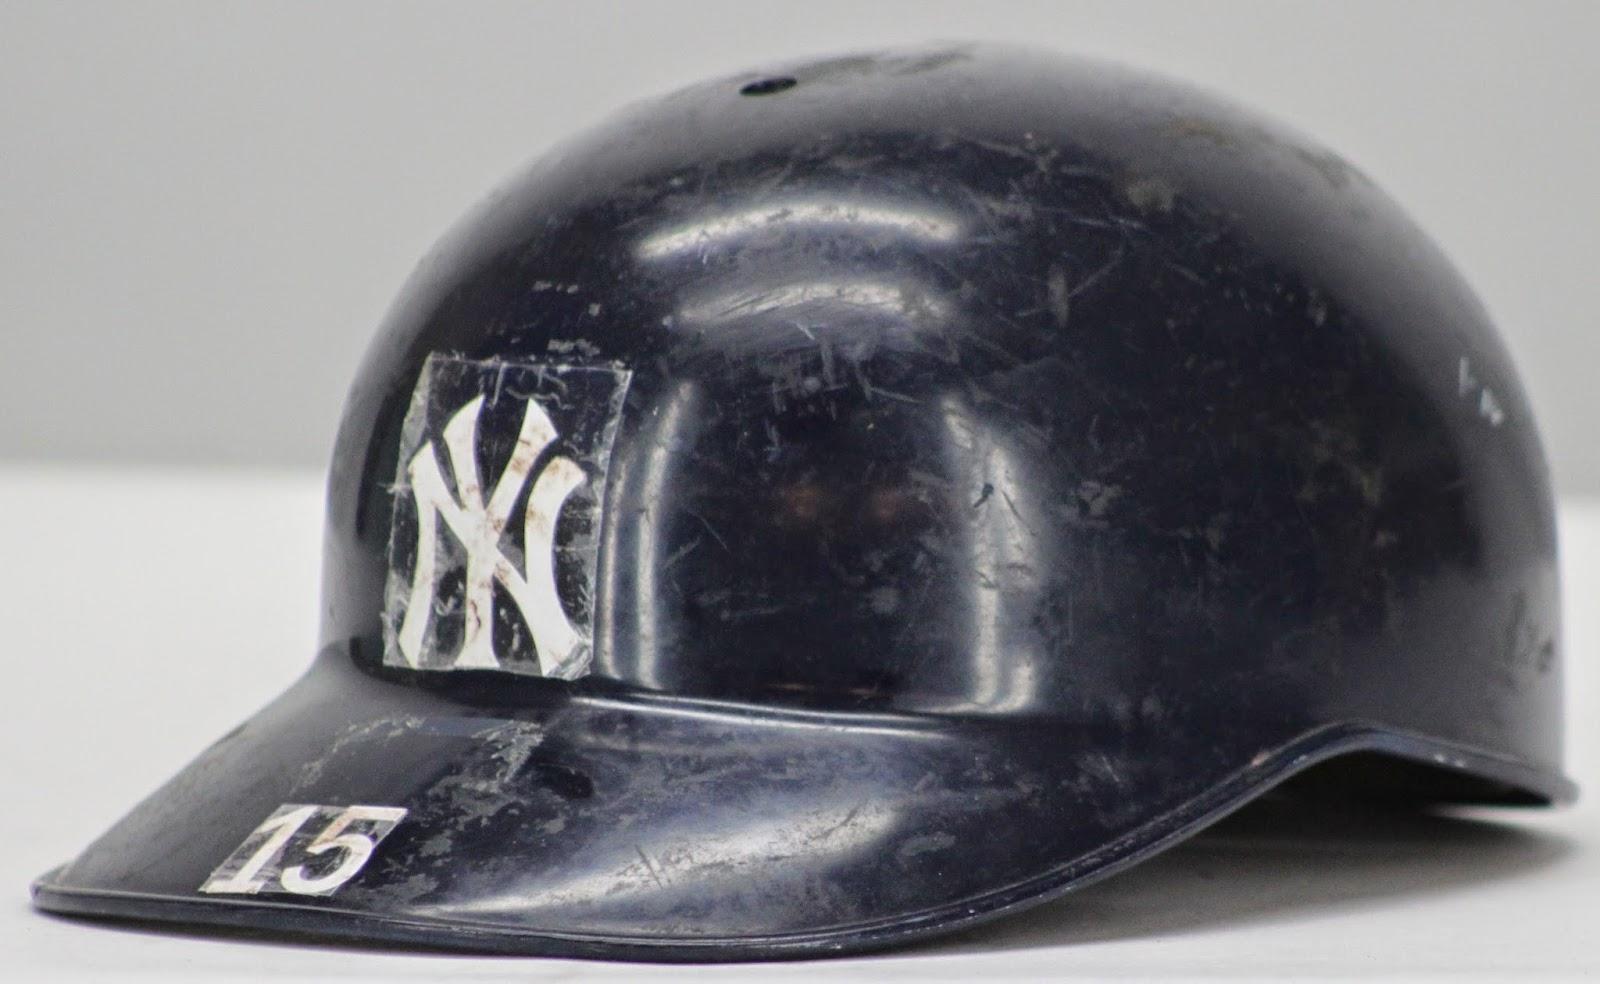 Thurman Munson number 15 helmet